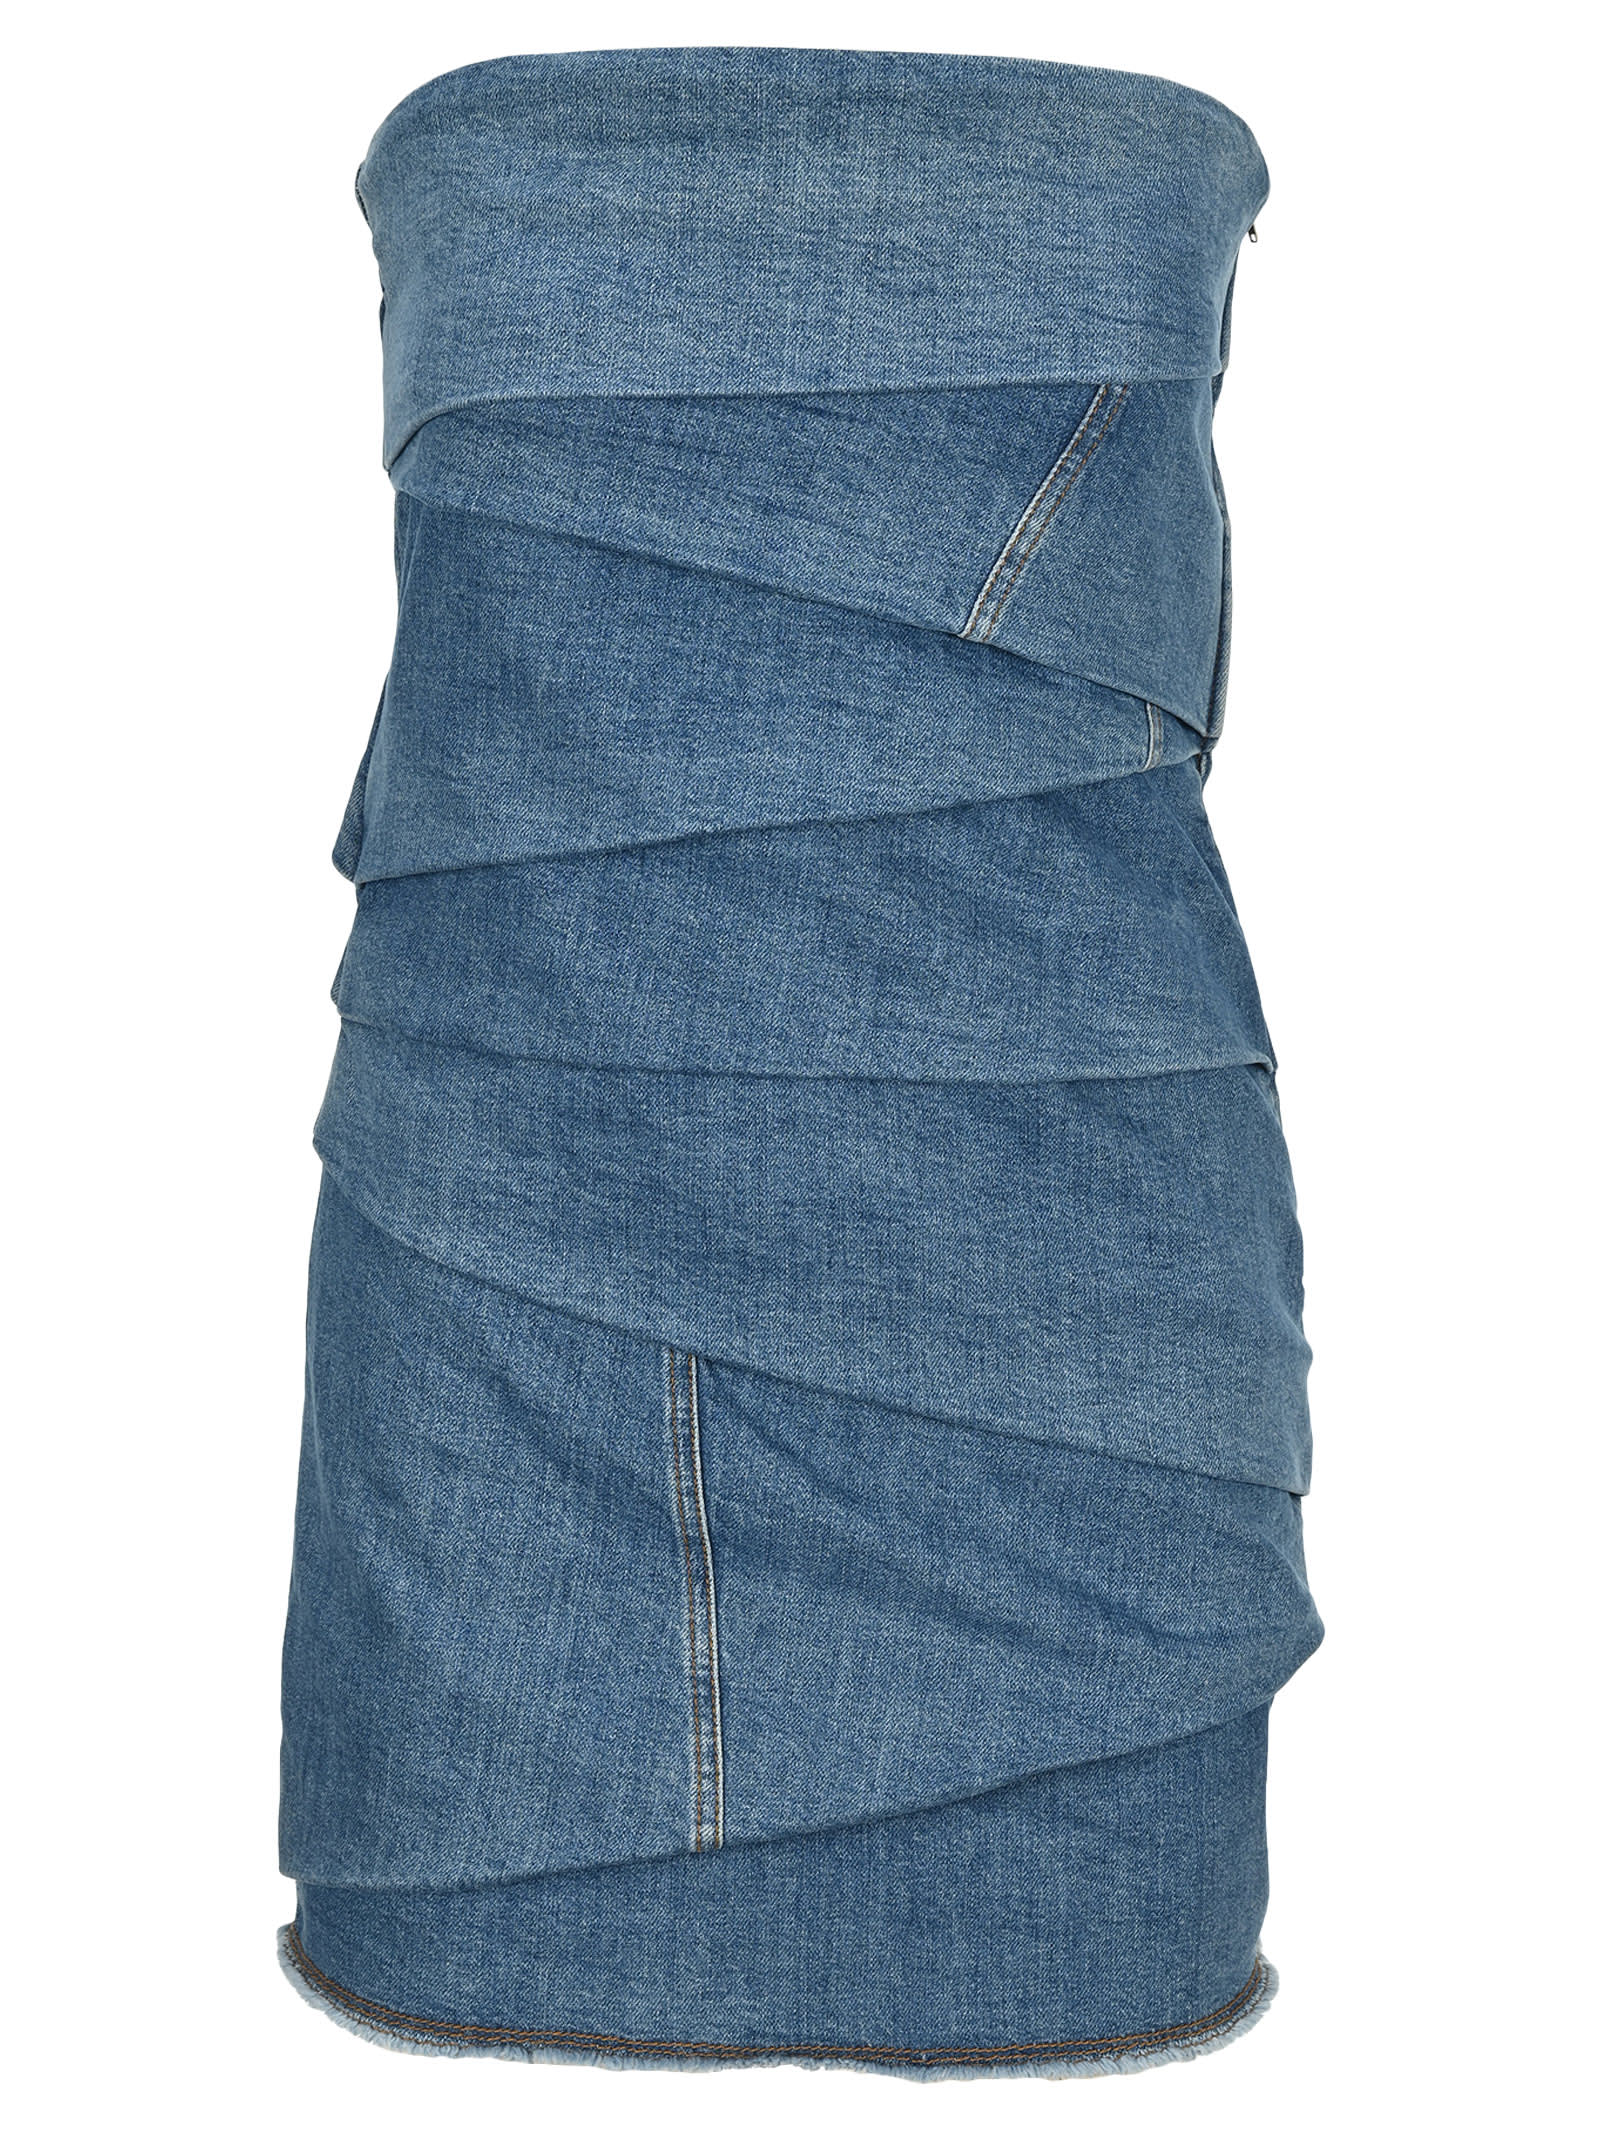 Buy Philosophy Denim Bustier Mini Dress online, shop Philosophy di Lorenzo Serafini with free shipping